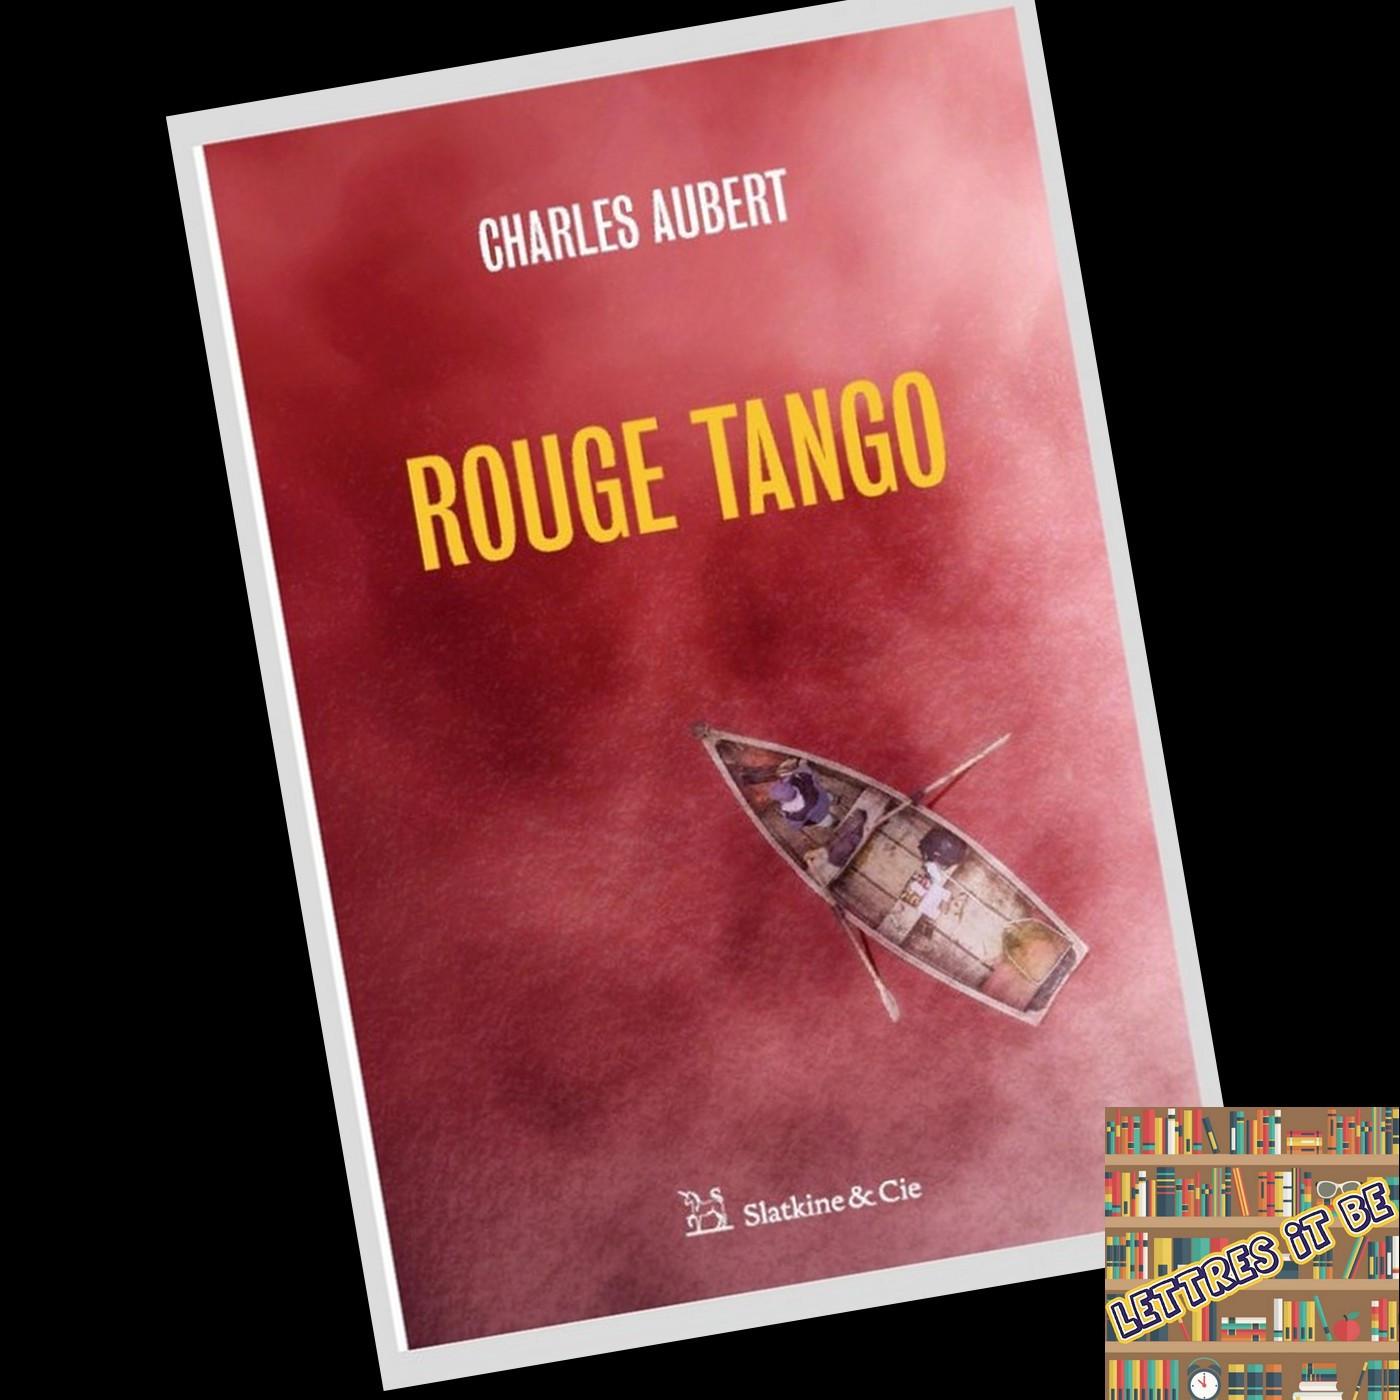 Critique de Rouge tango de Charles Aubert (Livre)